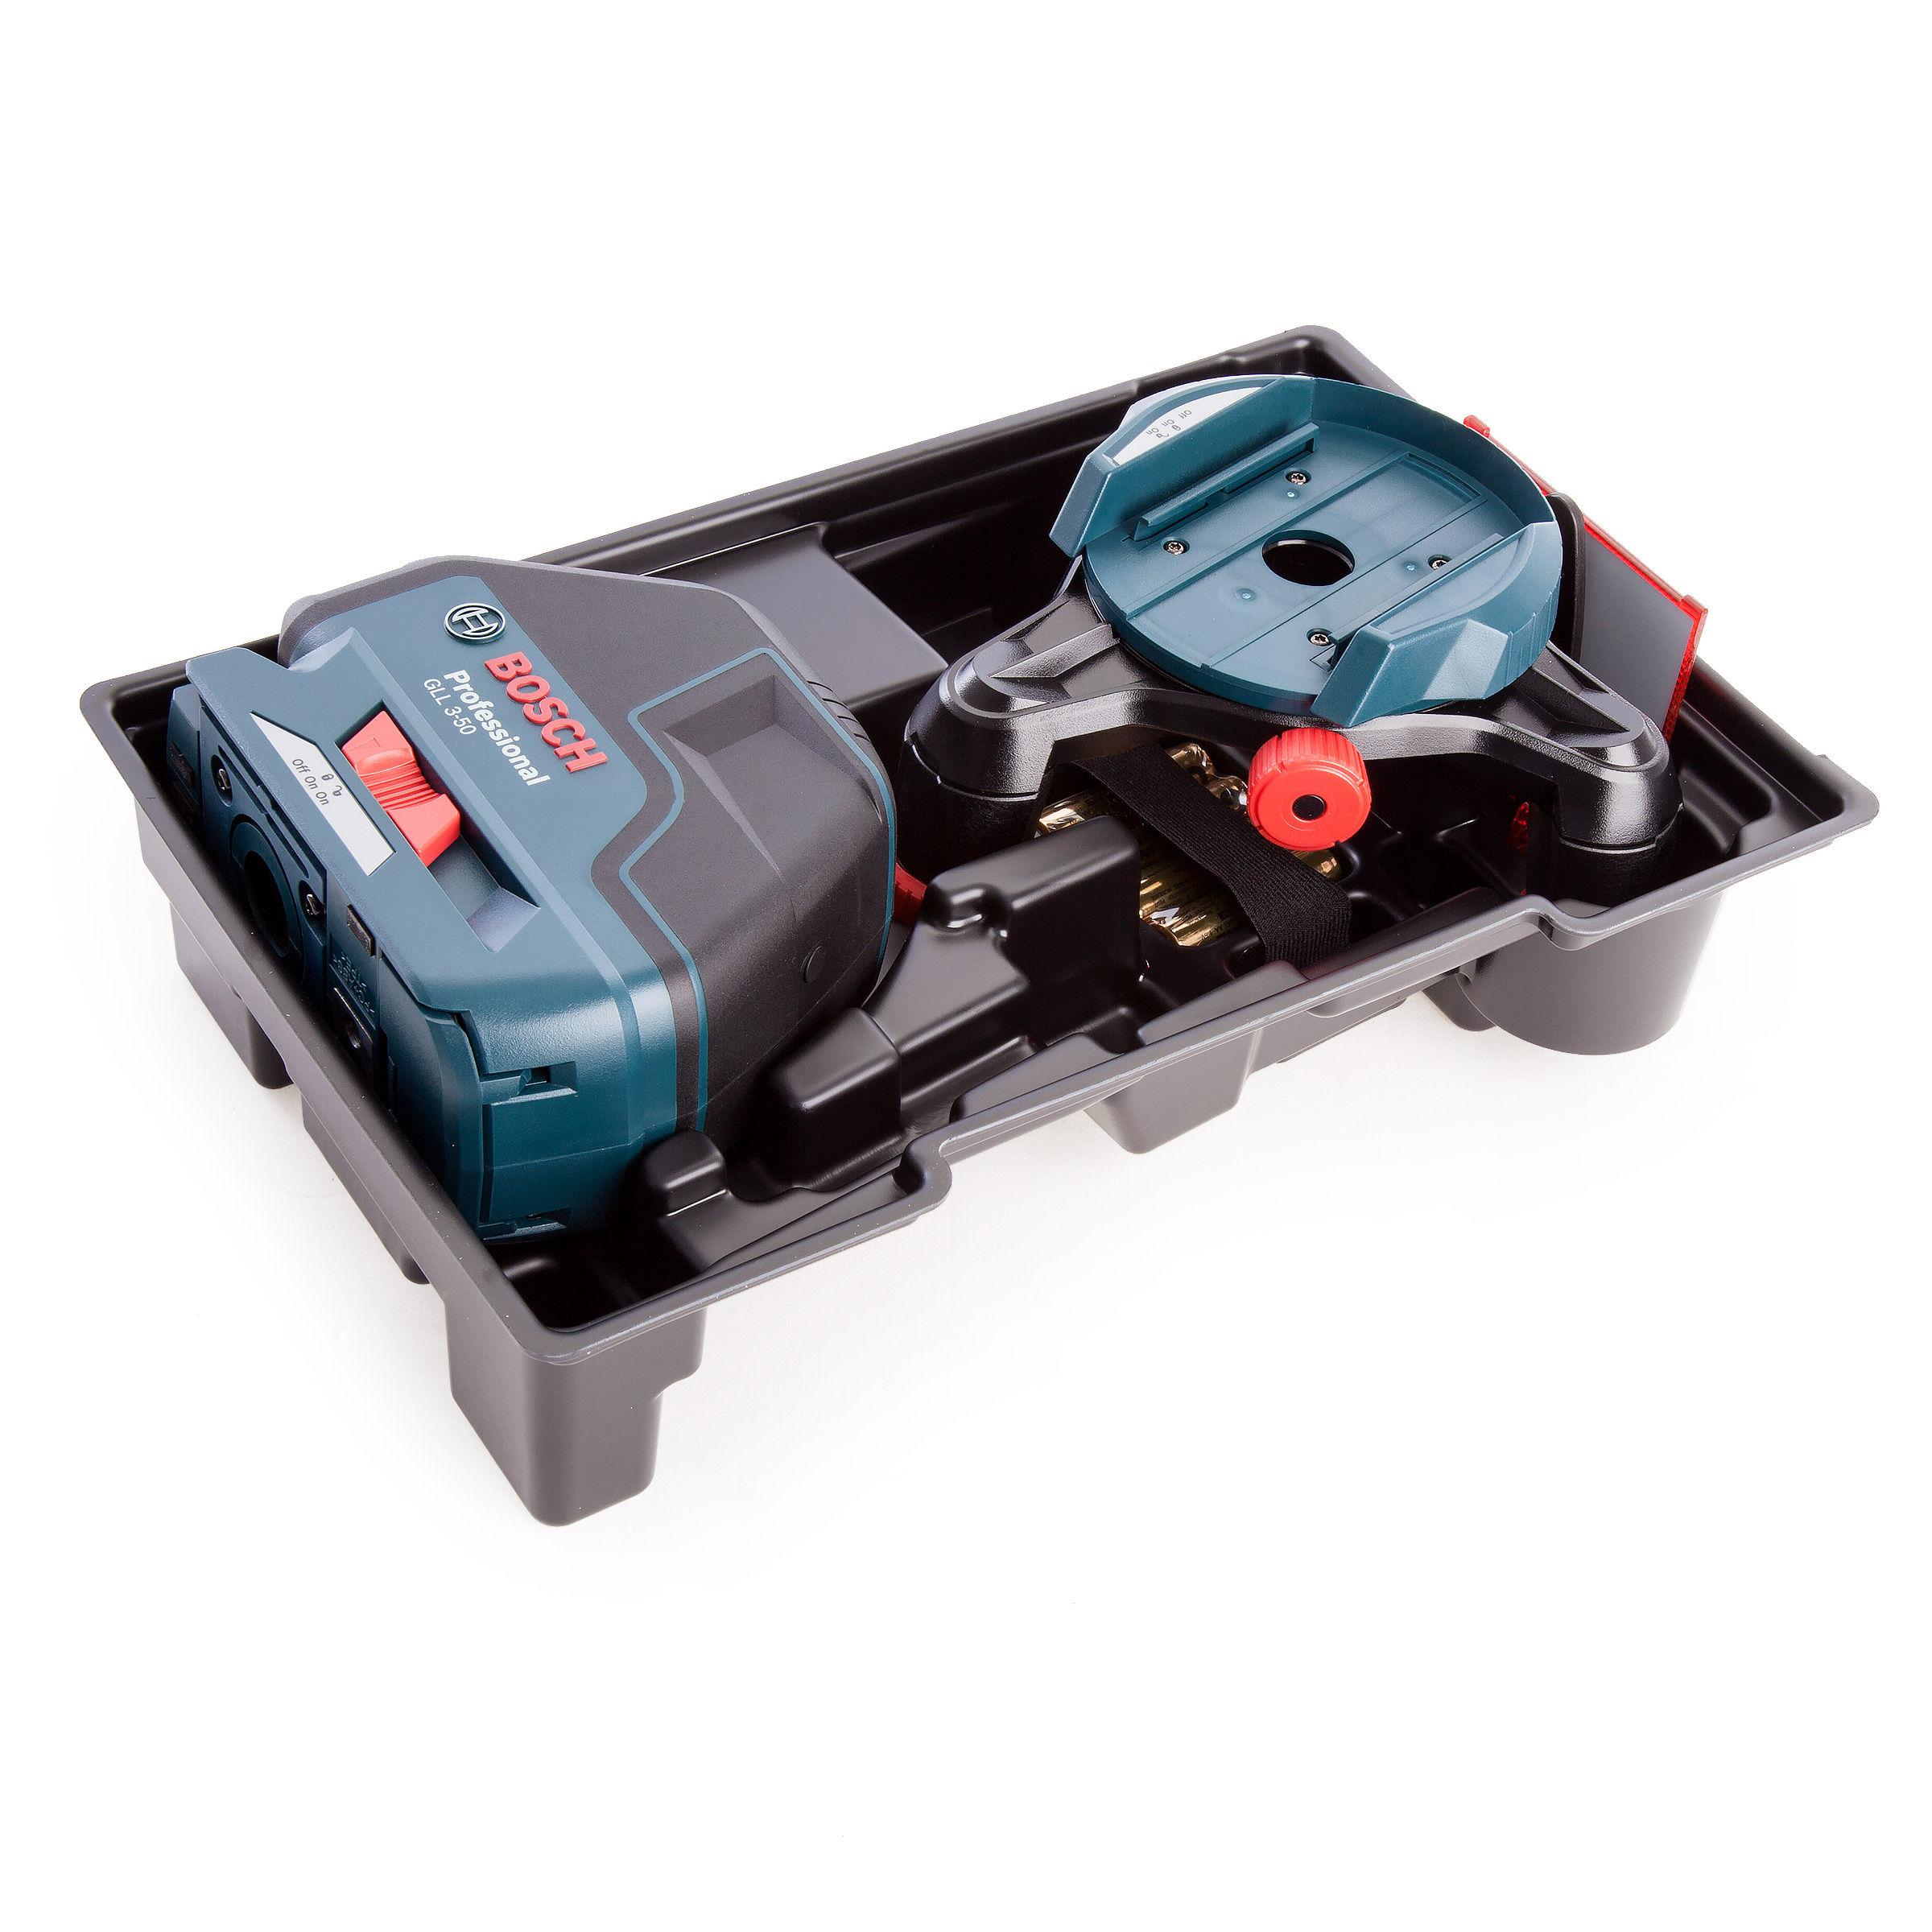 toolstop bosch gll 3 50 professional line laser. Black Bedroom Furniture Sets. Home Design Ideas